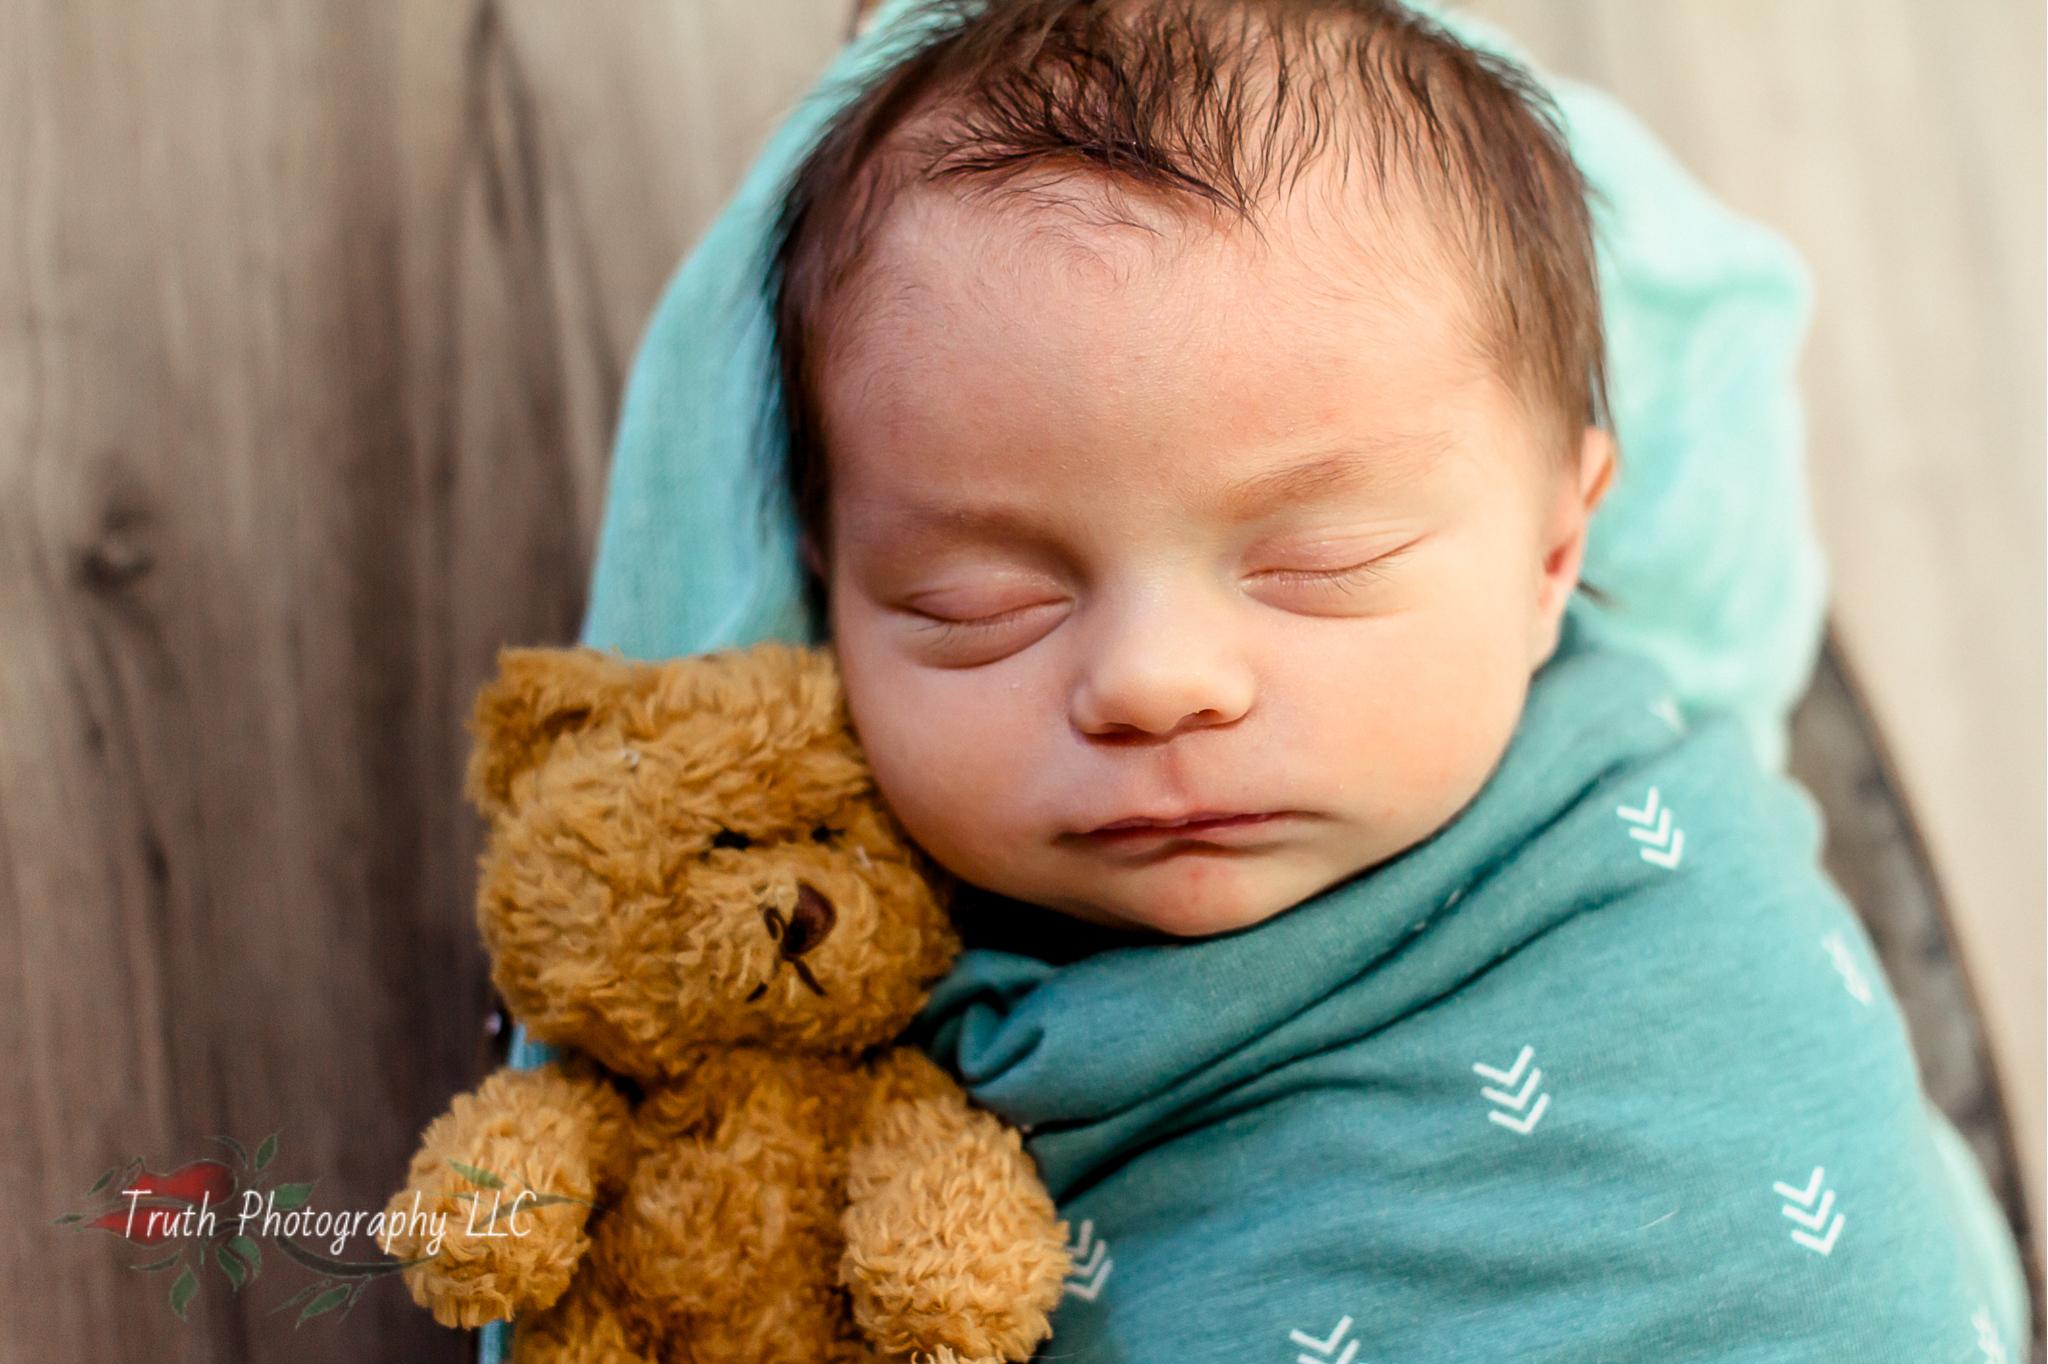 Truth-Photography-Broomfield-newborn-photo-shoot.jpg